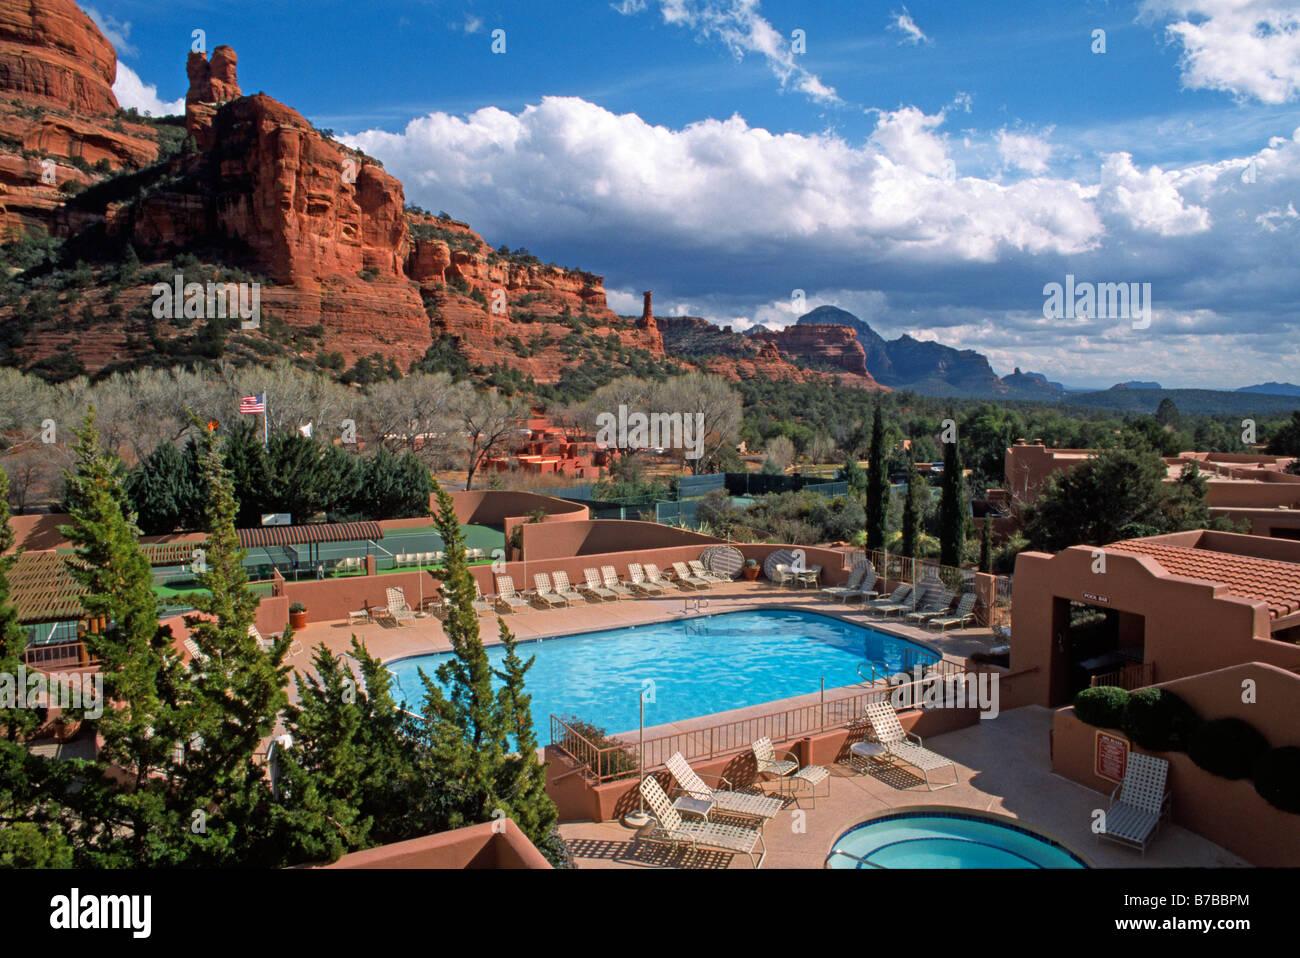 Five Star Hotels In Scottsdale Arizona